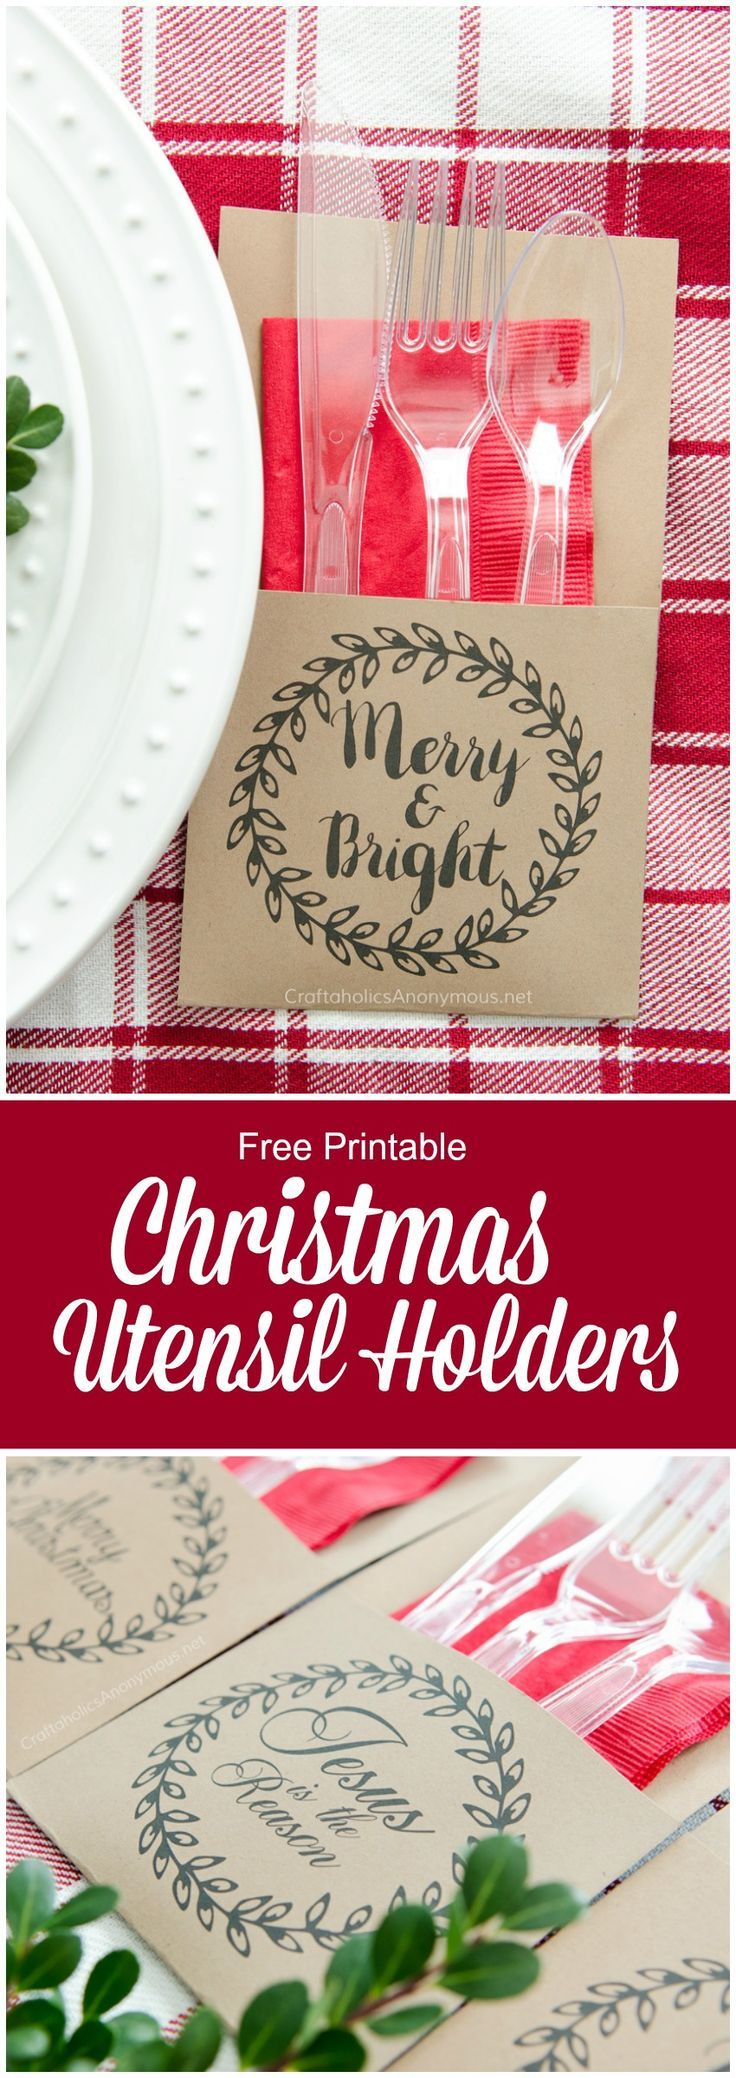 Craftaholics Anonymous Free Printable Christmas Utensil Holder Christmas Party Decorations Diy Free Christmas Printables Christmas Party Decorations